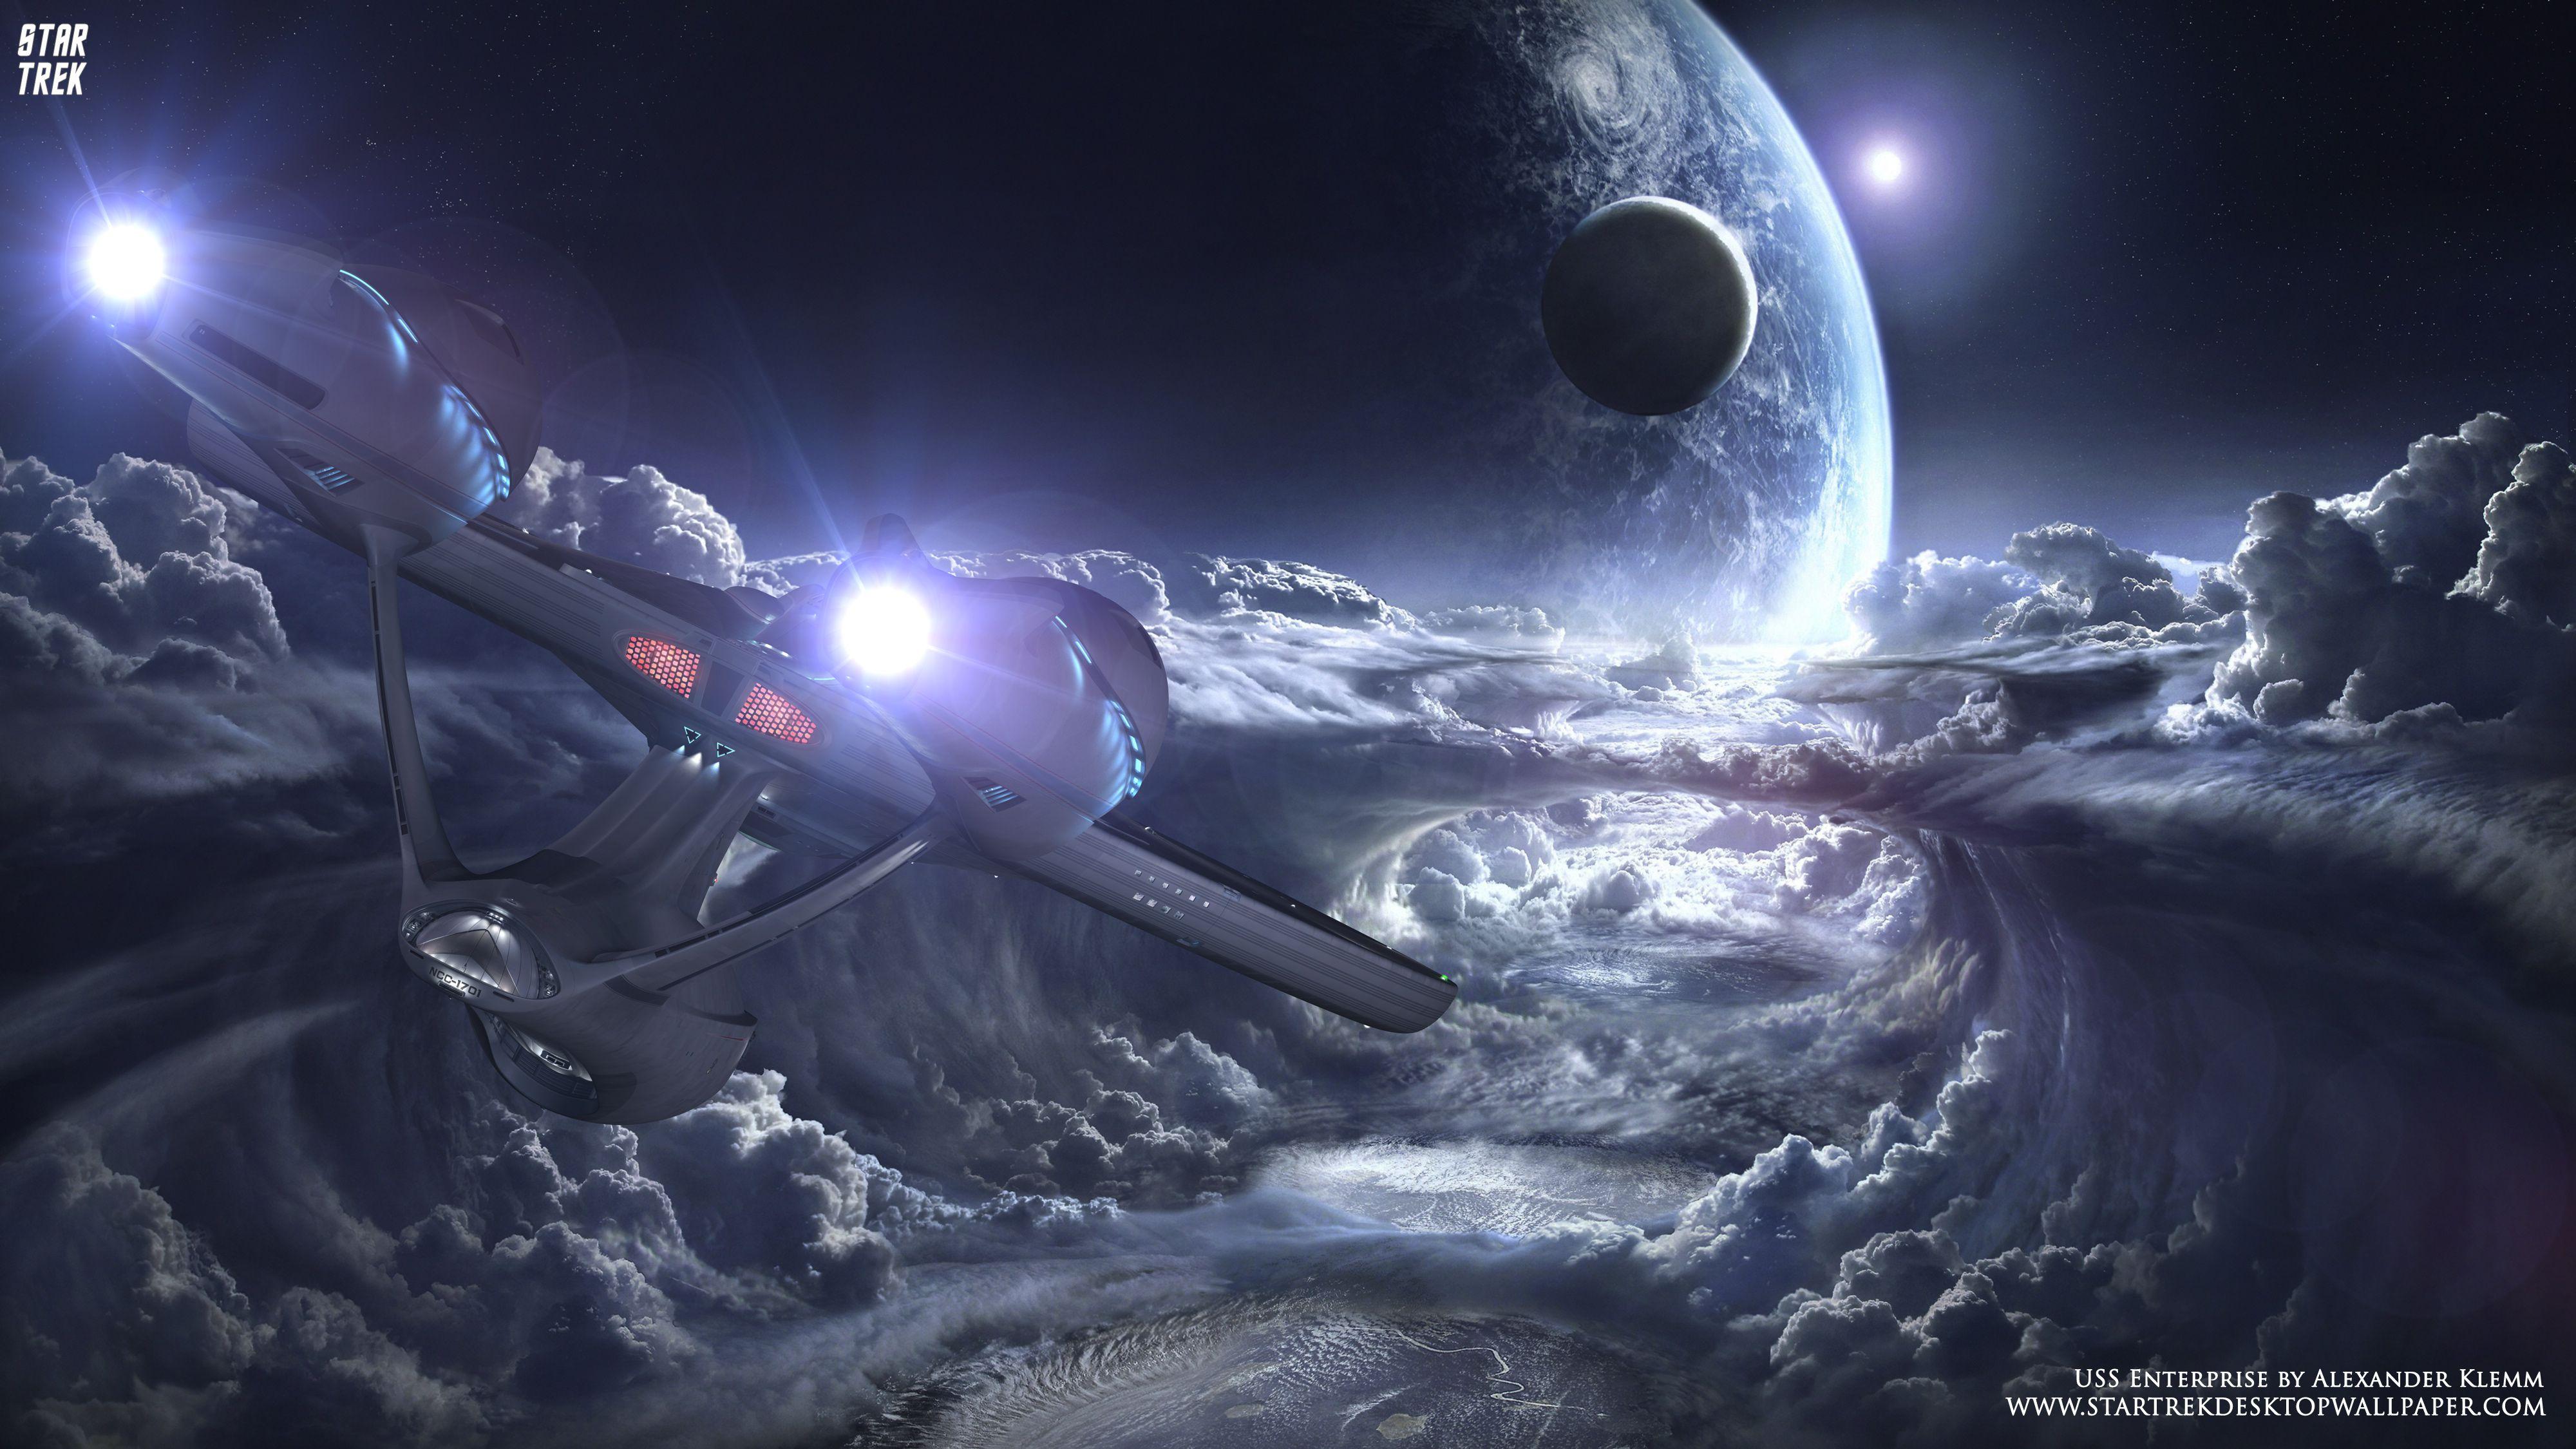 Star Trek Uss Enterprise Ncc 1701 Over New Planet Free